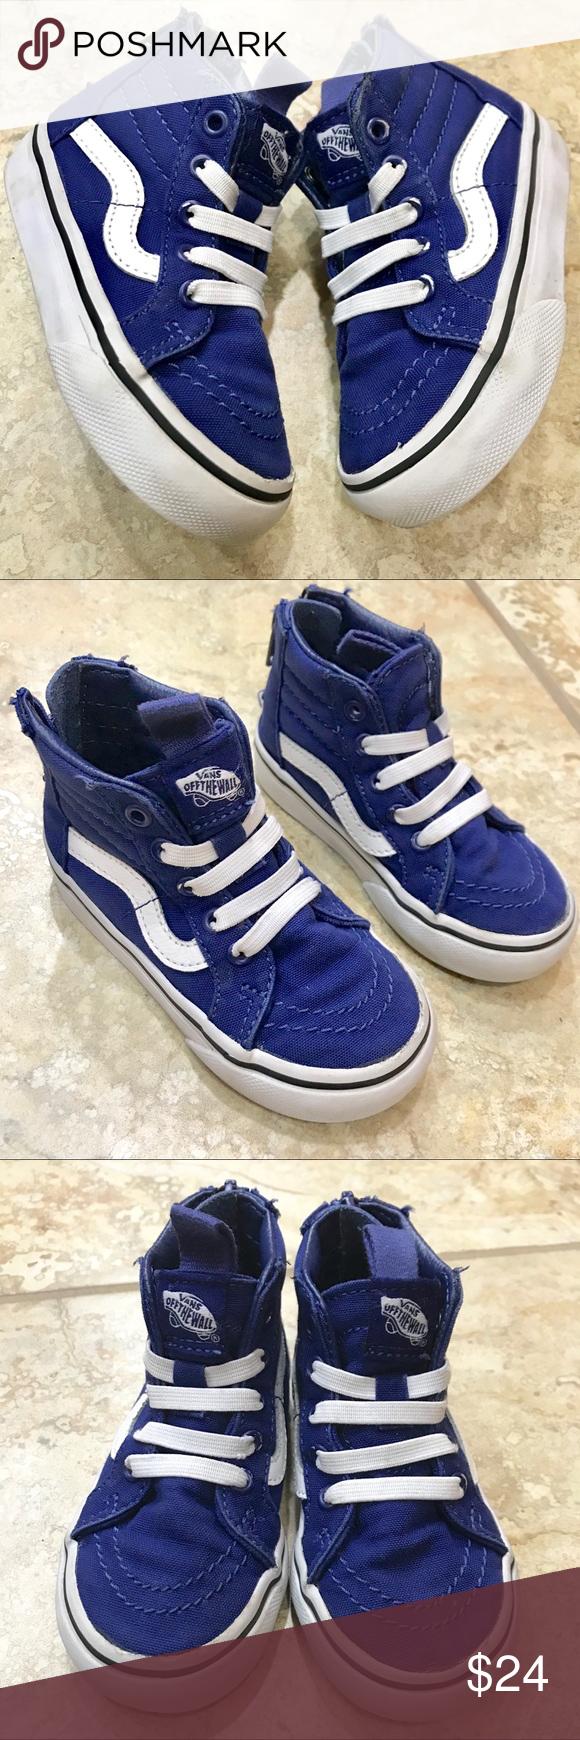 266e4b31c4c Toddlers Vans Sk8-Hi Zip- Royal Blue   White Size 6. Canvas upper ...